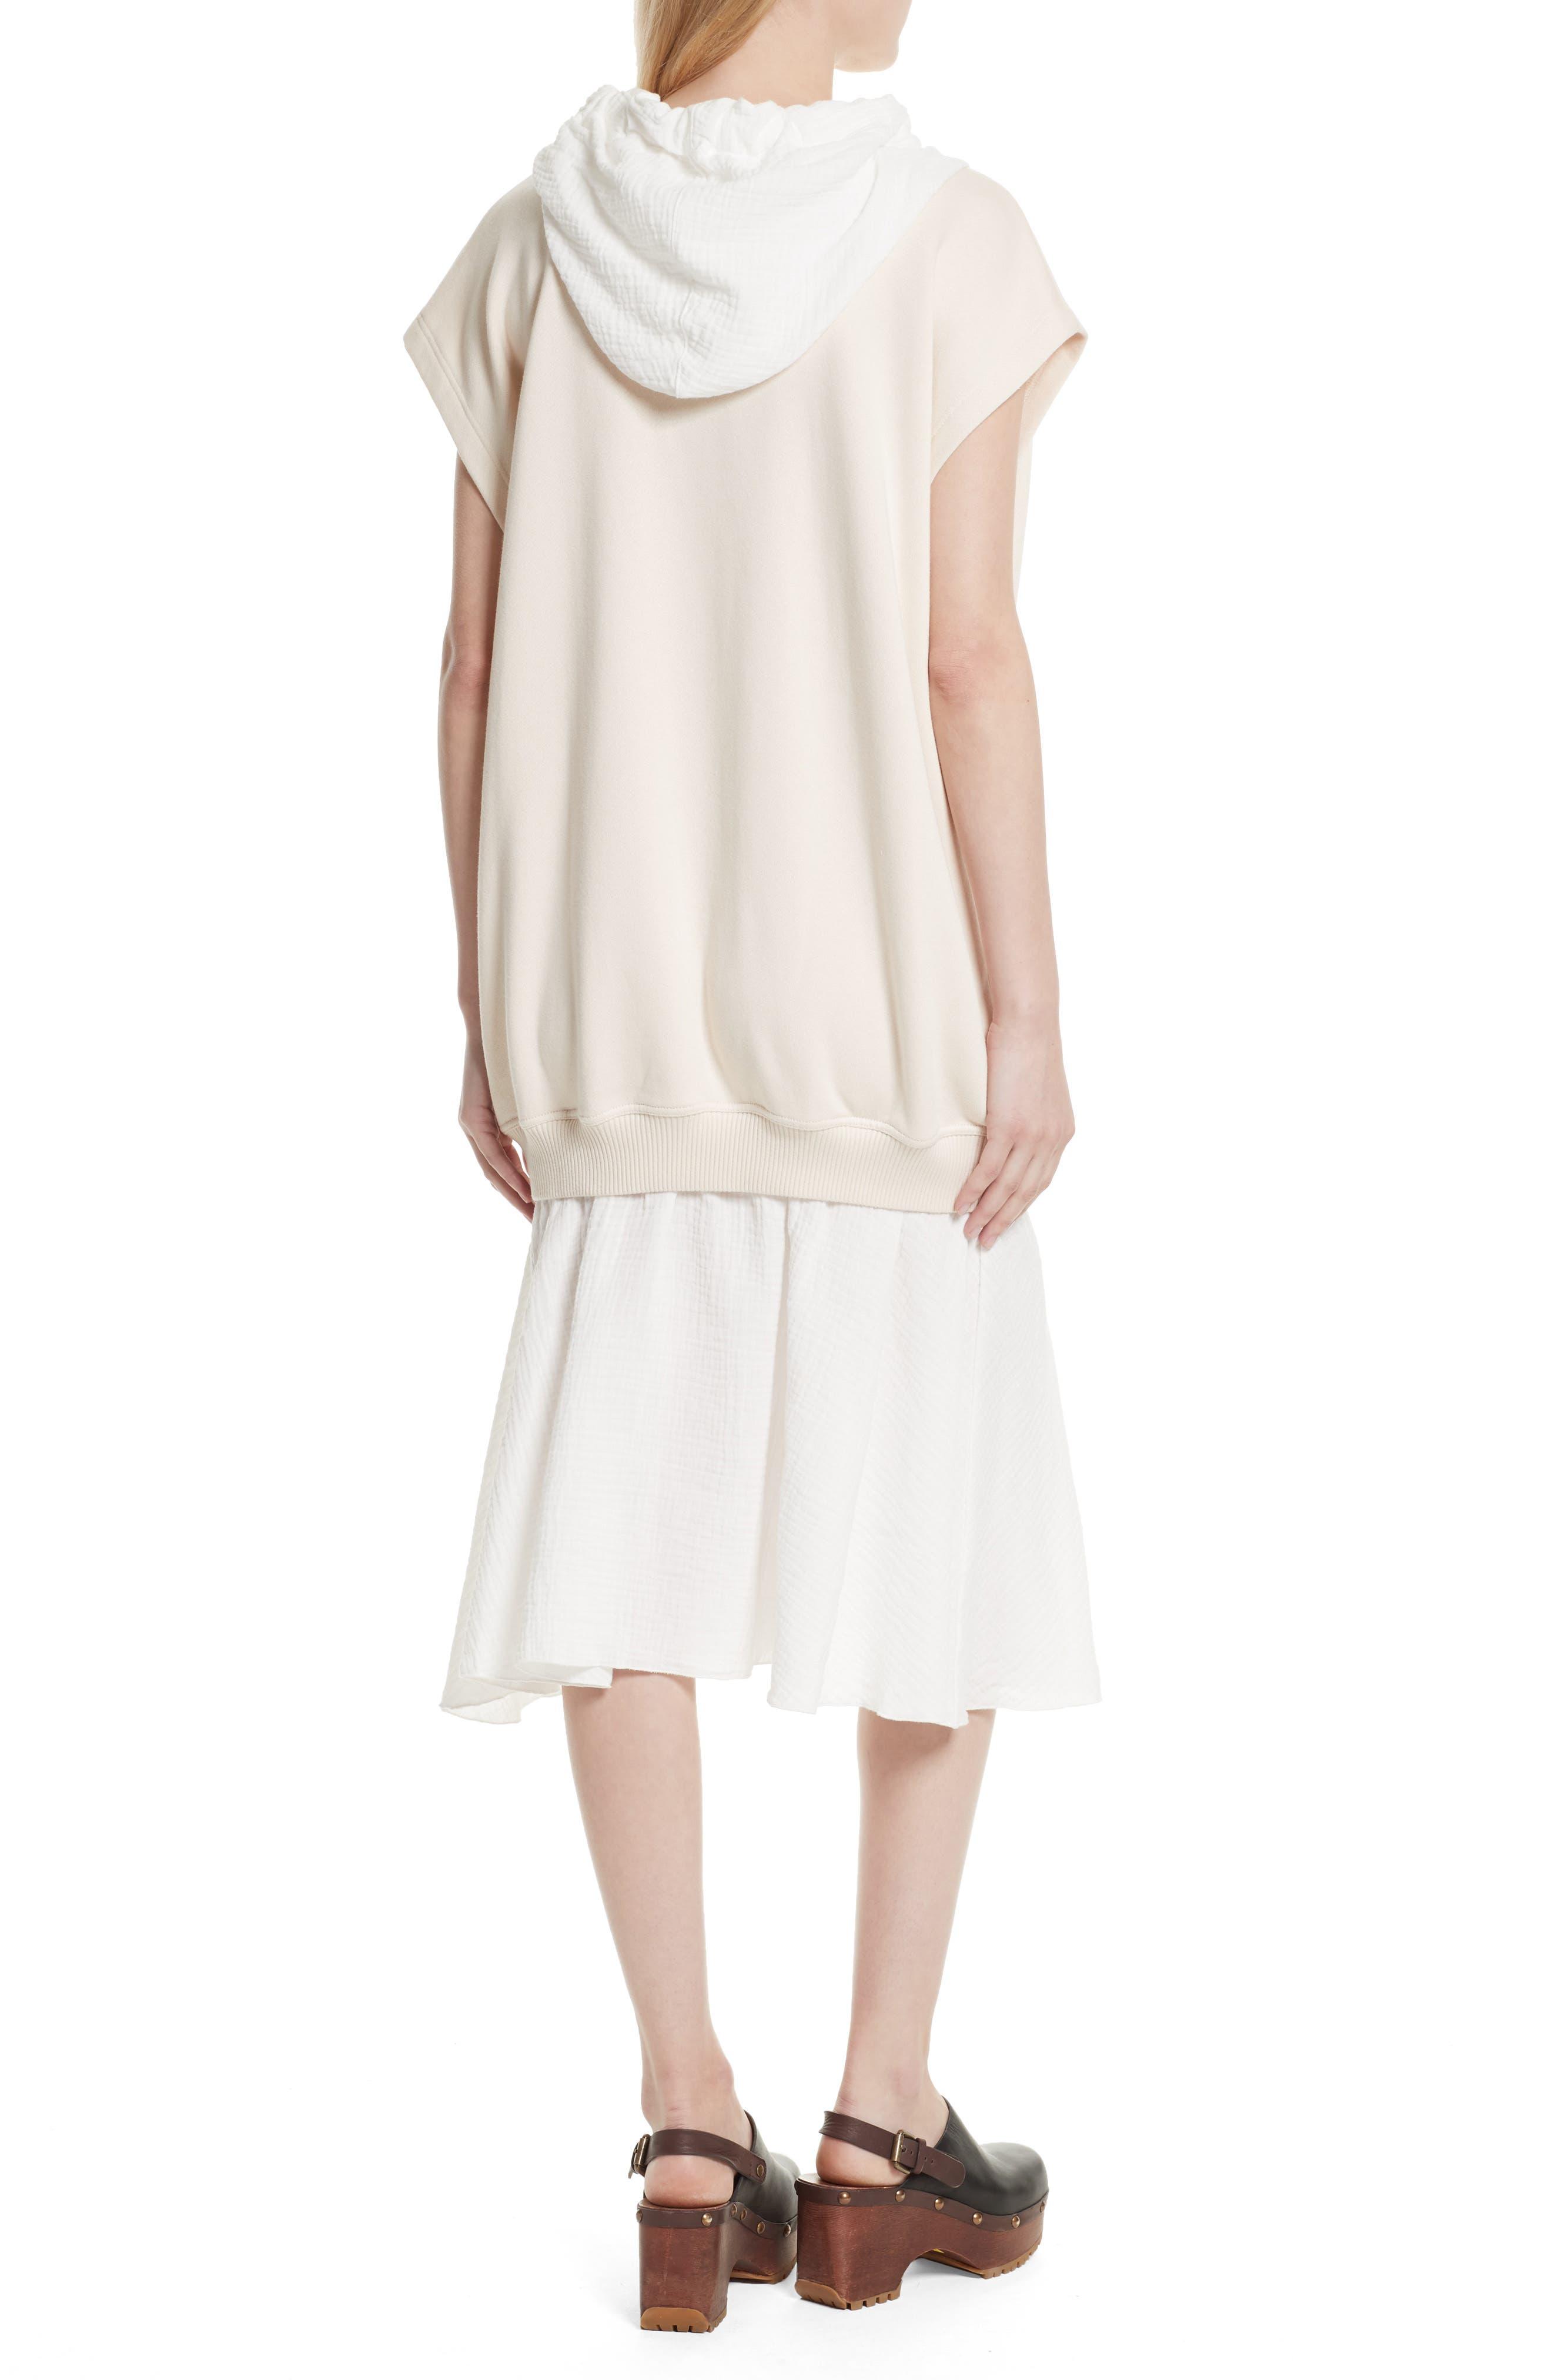 Hooded Sweatshirt Overlay Dress,                             Alternate thumbnail 2, color,                             170